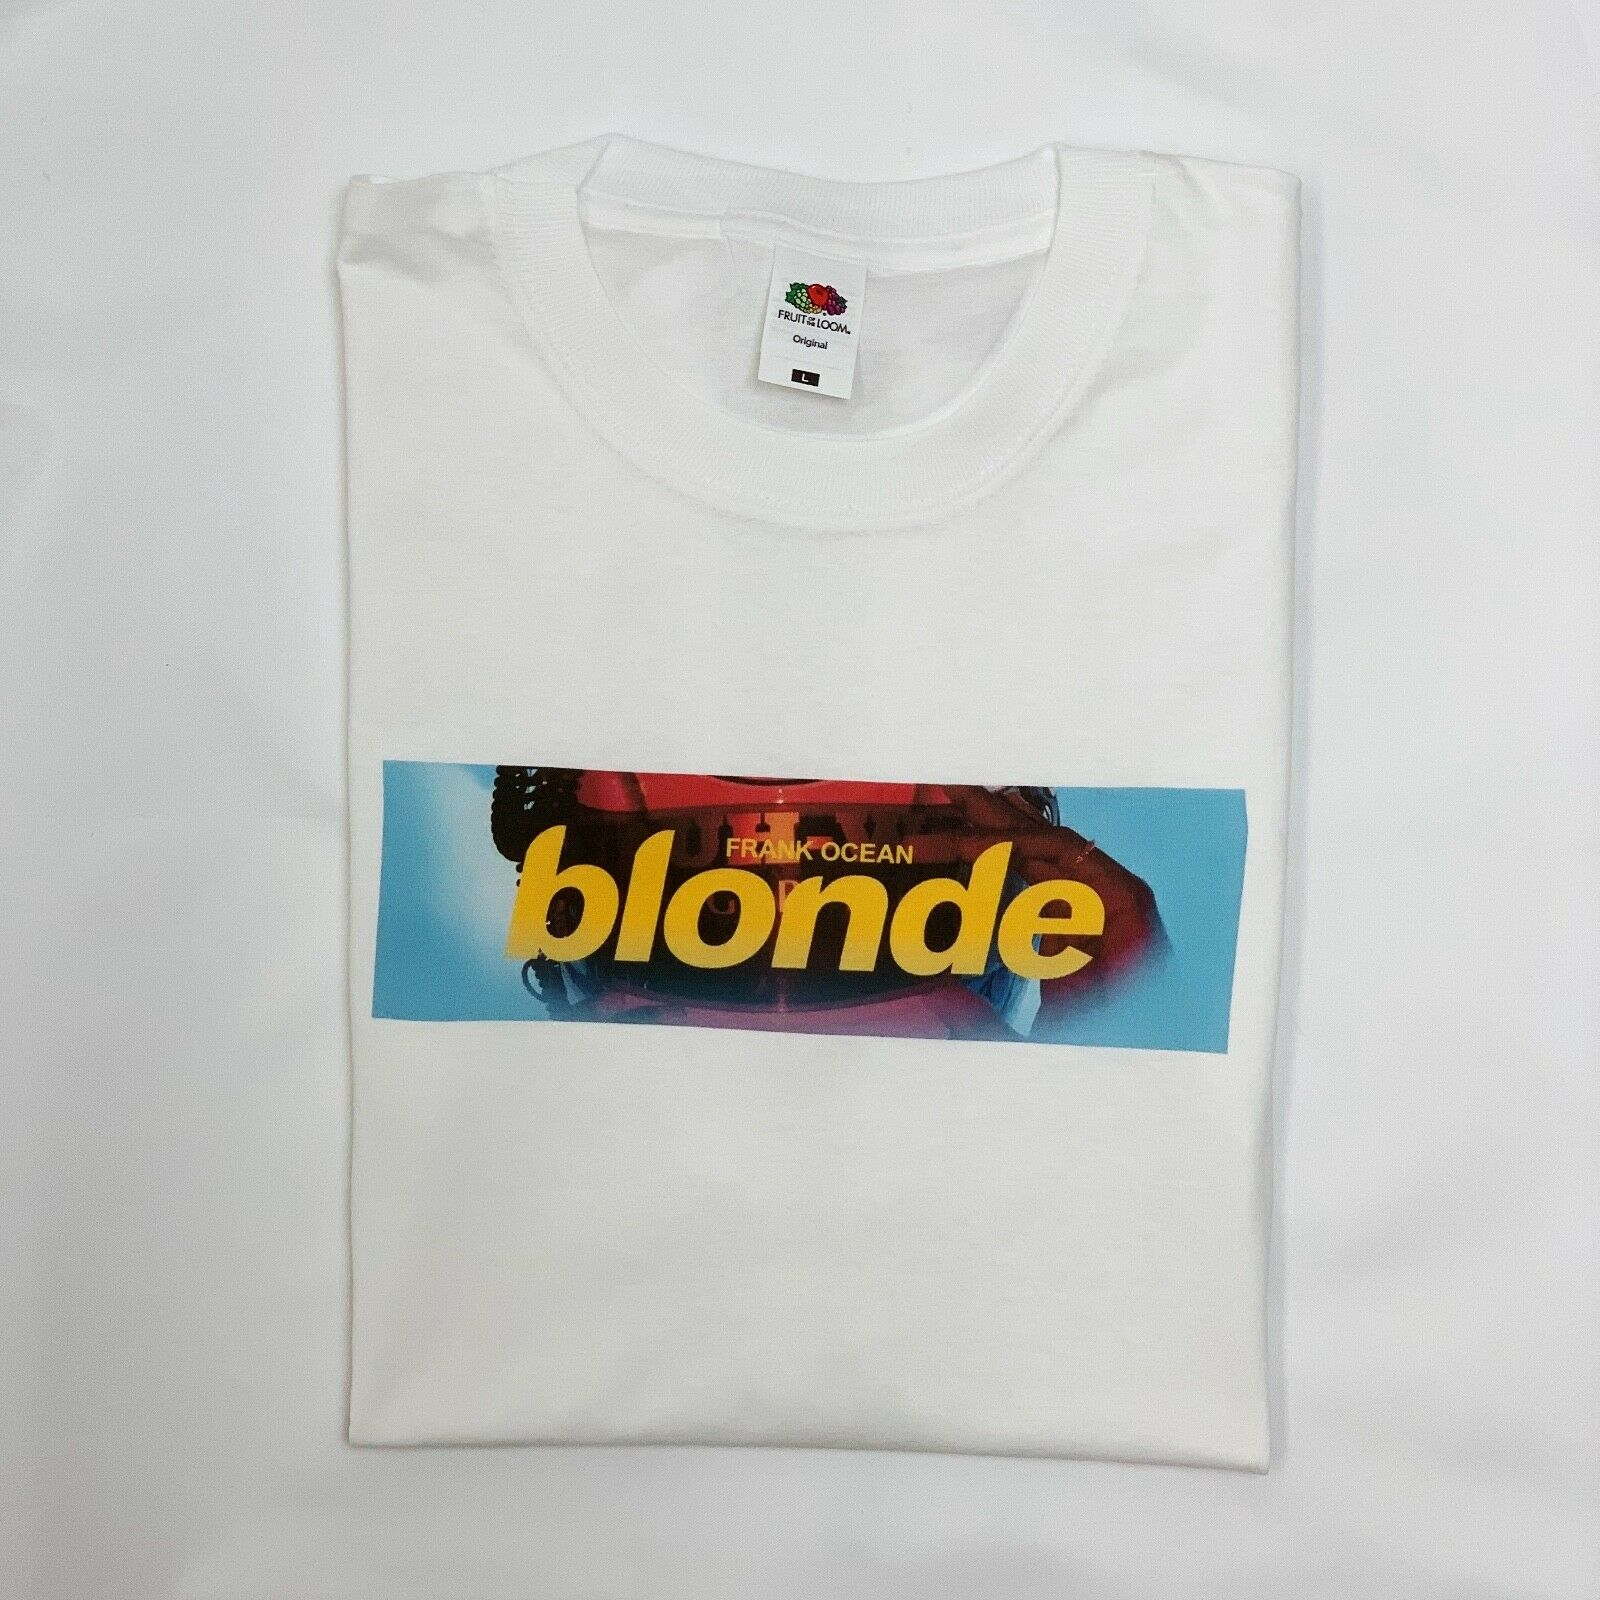 Blond Vintage T-shirt Frank Orange Ocean Tee Boys Cry Flex Channel Lens Top